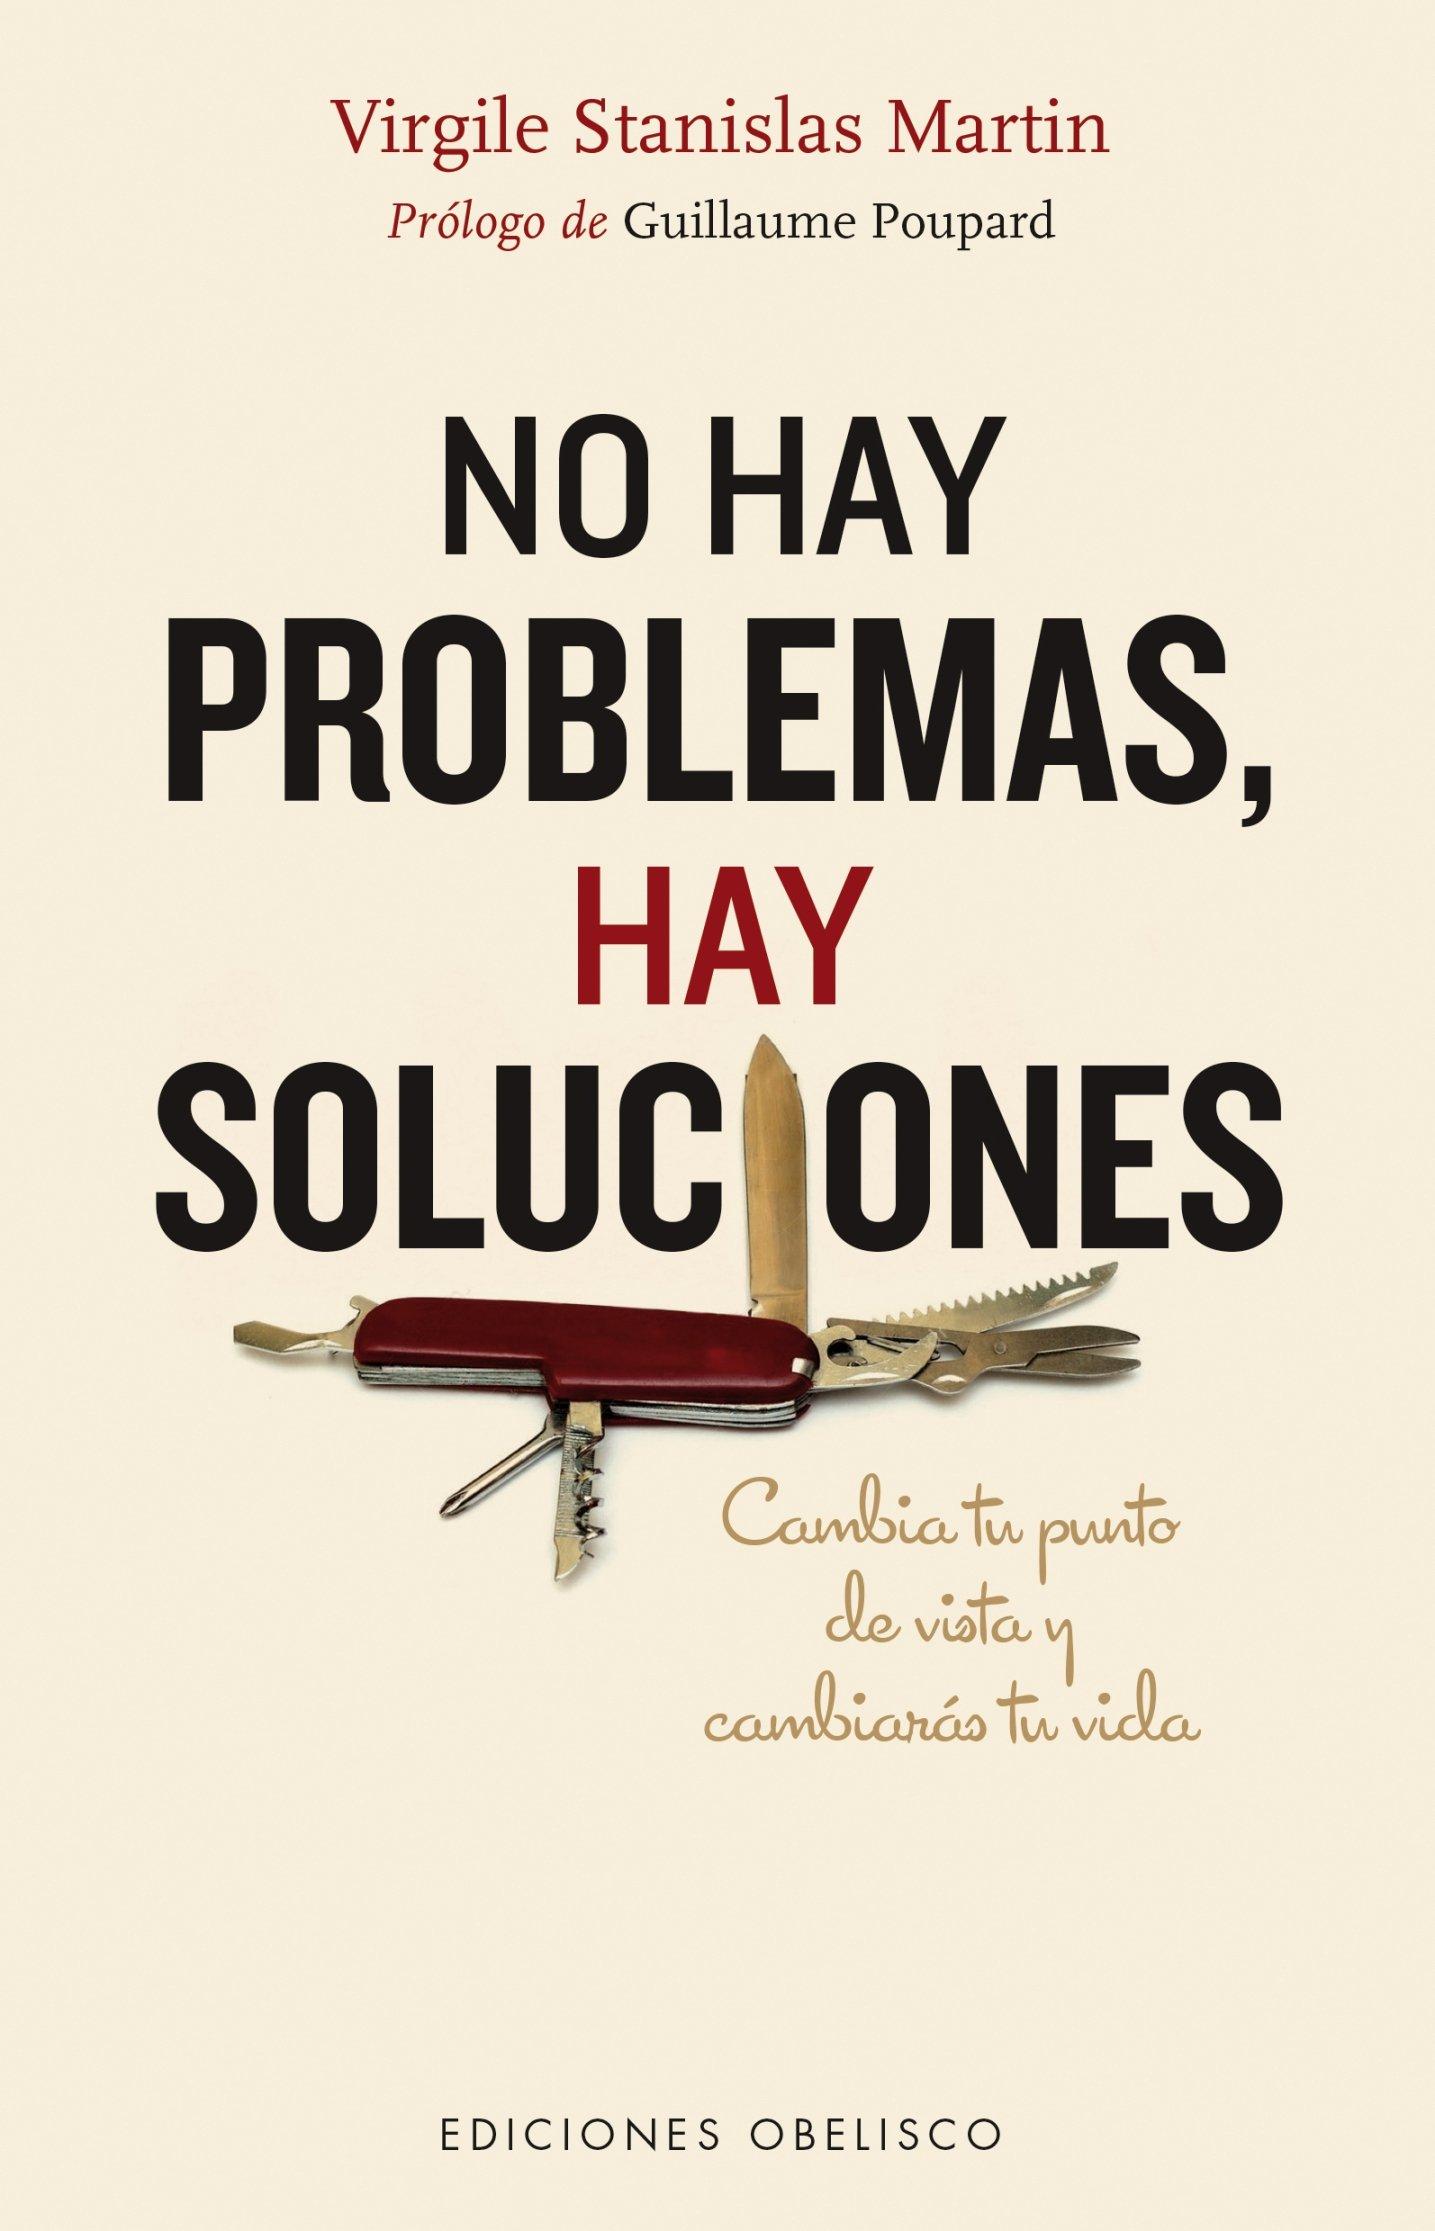 No Hay Problemas Soluciones Spanish Edition Virgile Stanislas Martin 9788416192595 Amazon Books